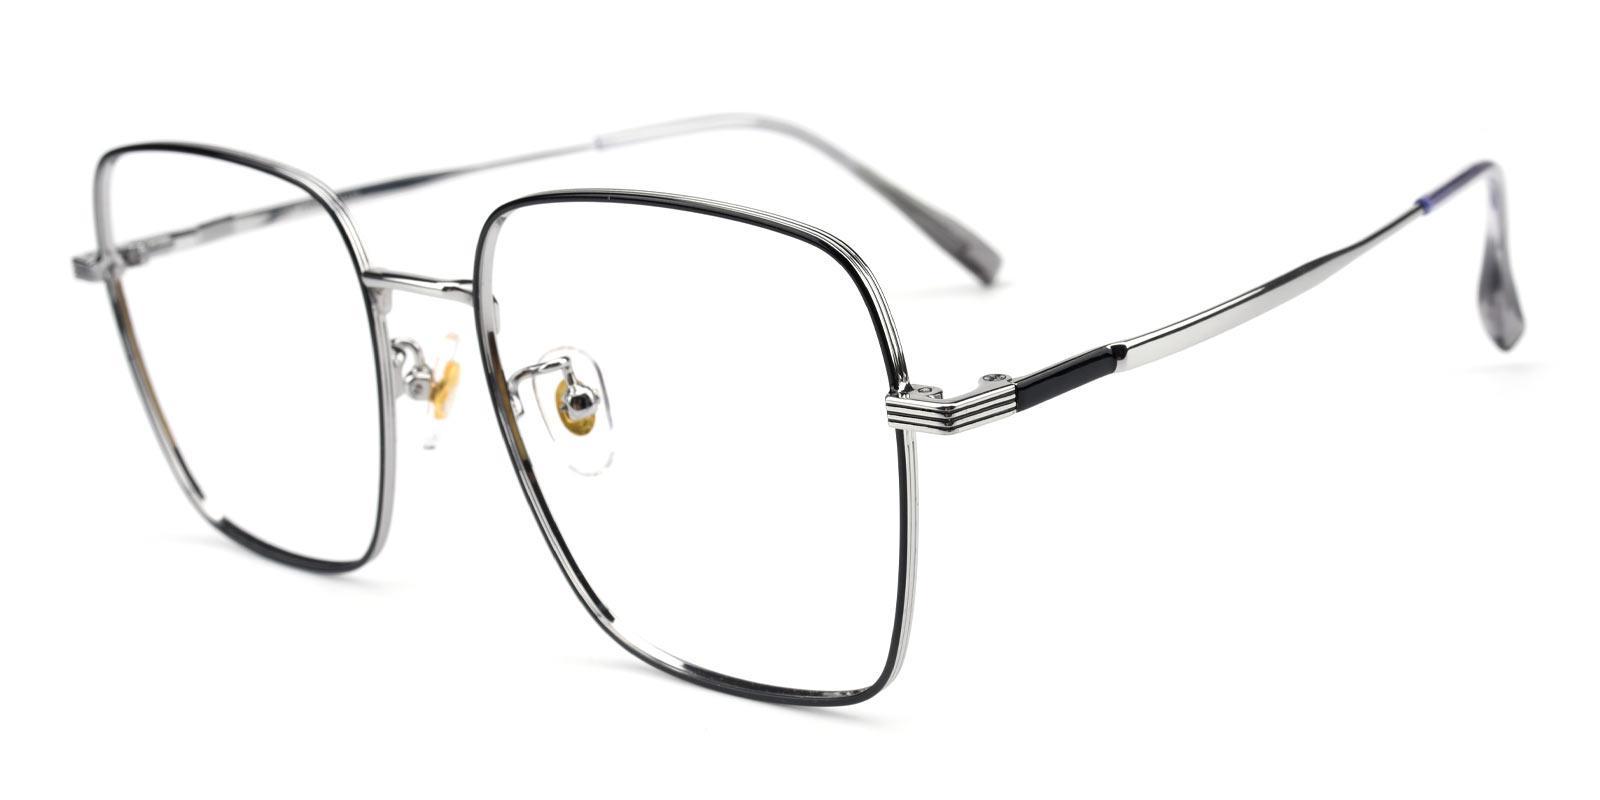 Joa-Black-Square-Titanium-Eyeglasses-additional1